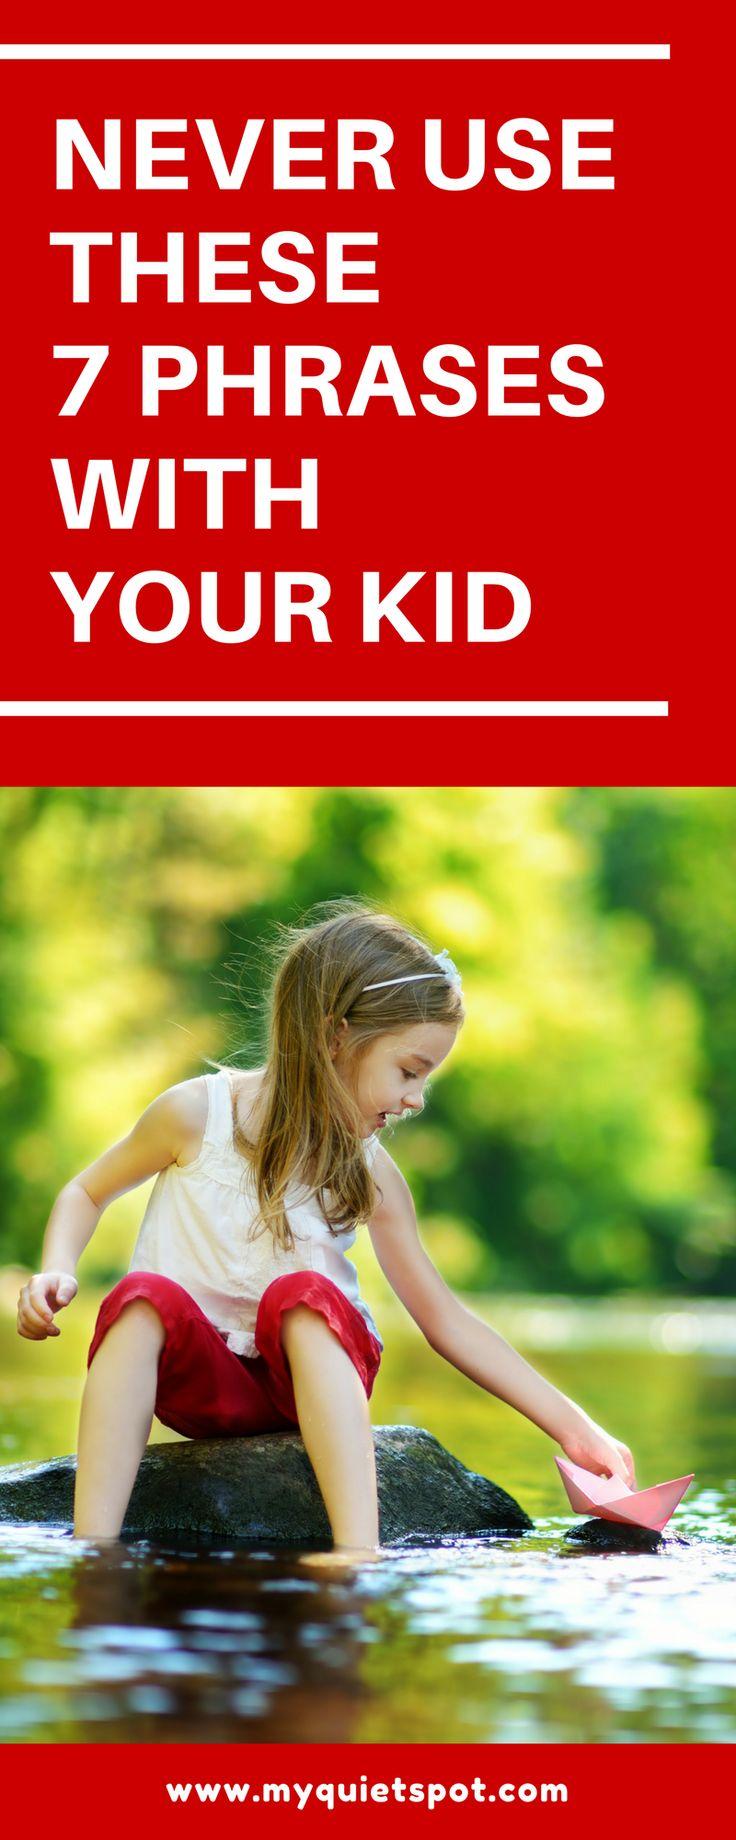 neverusethese7phraseswithyourkid Kids behavior